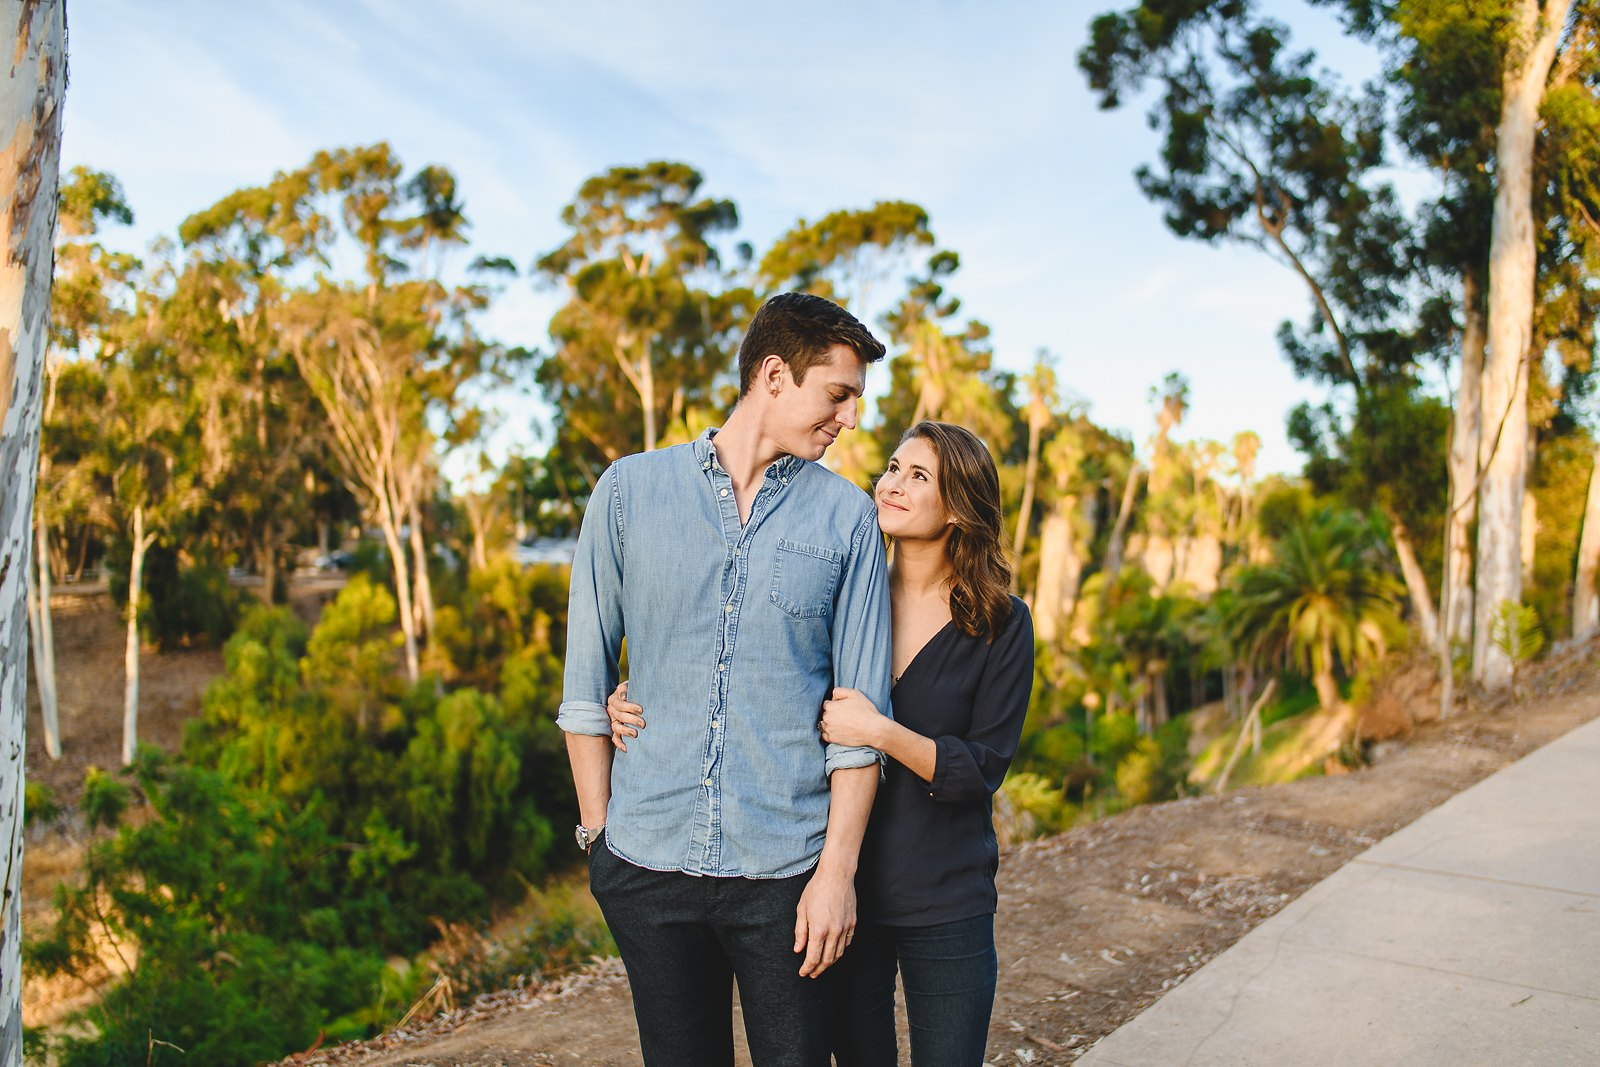 balboa-park-engagement-photos-9.jpg